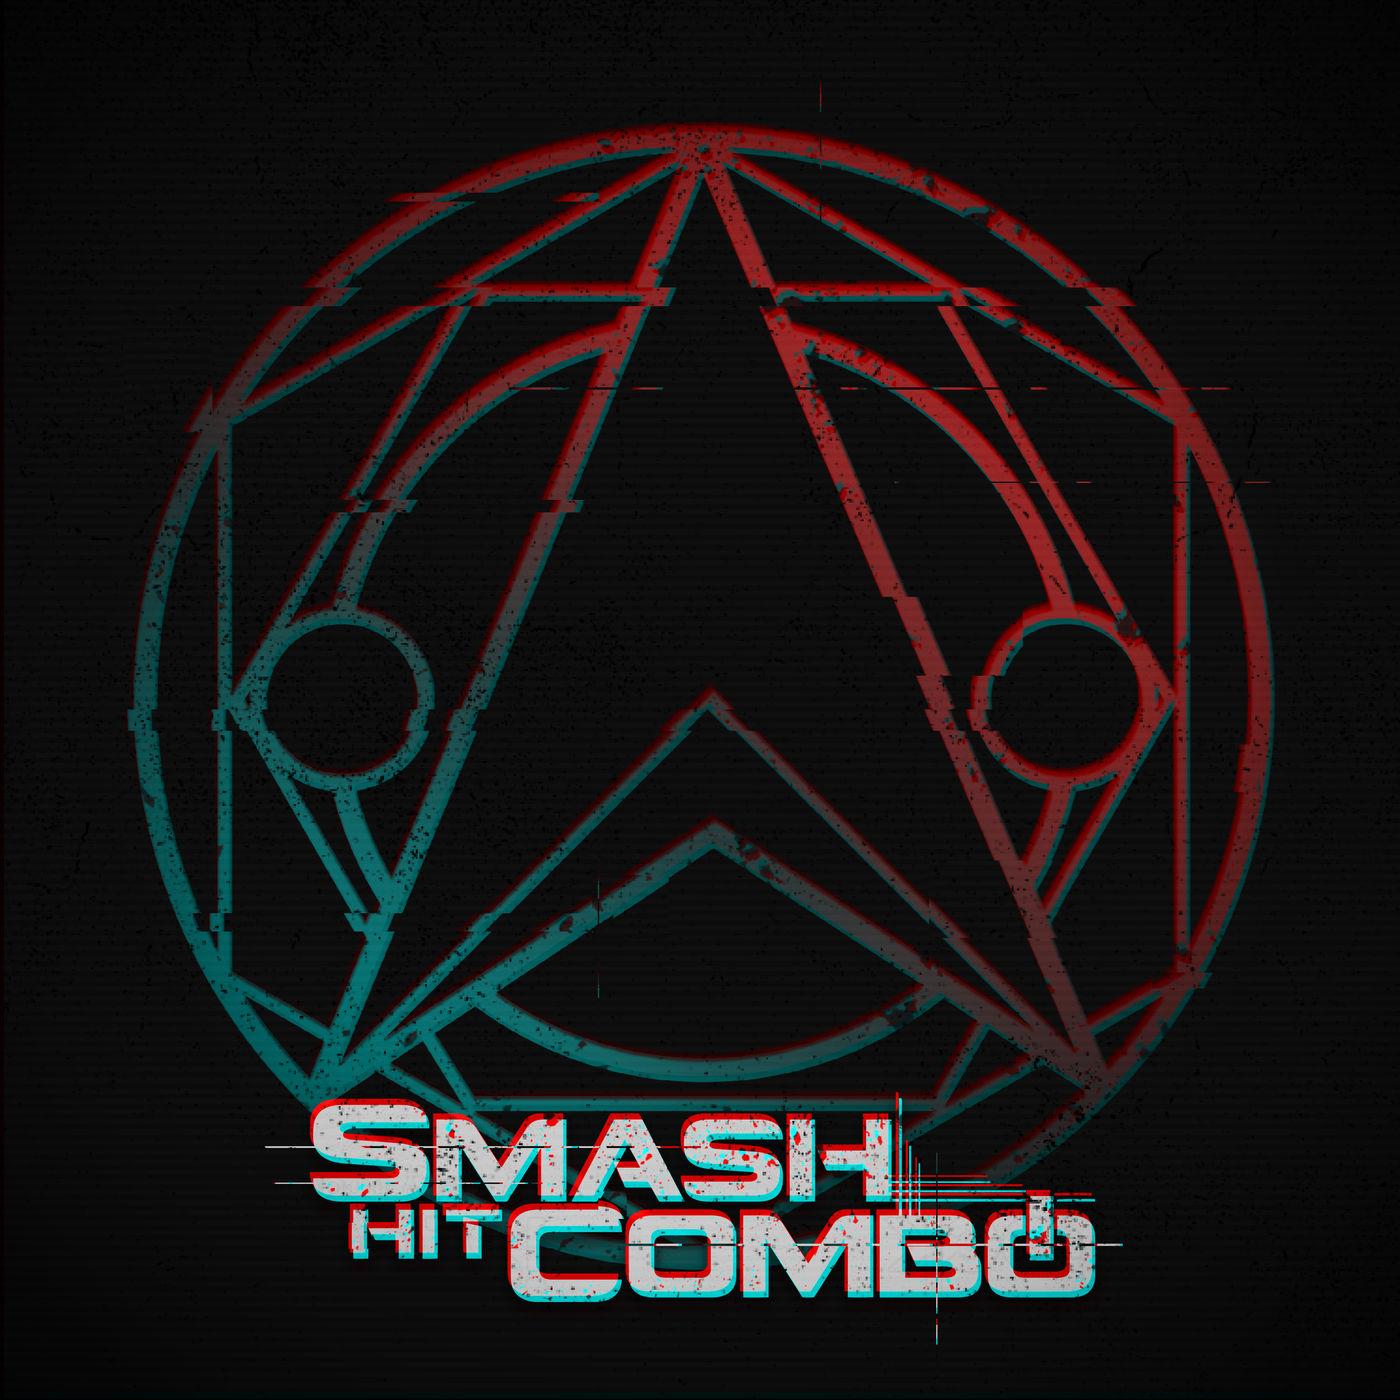 Smash Hit Combo - Contre courant [single] (2020)